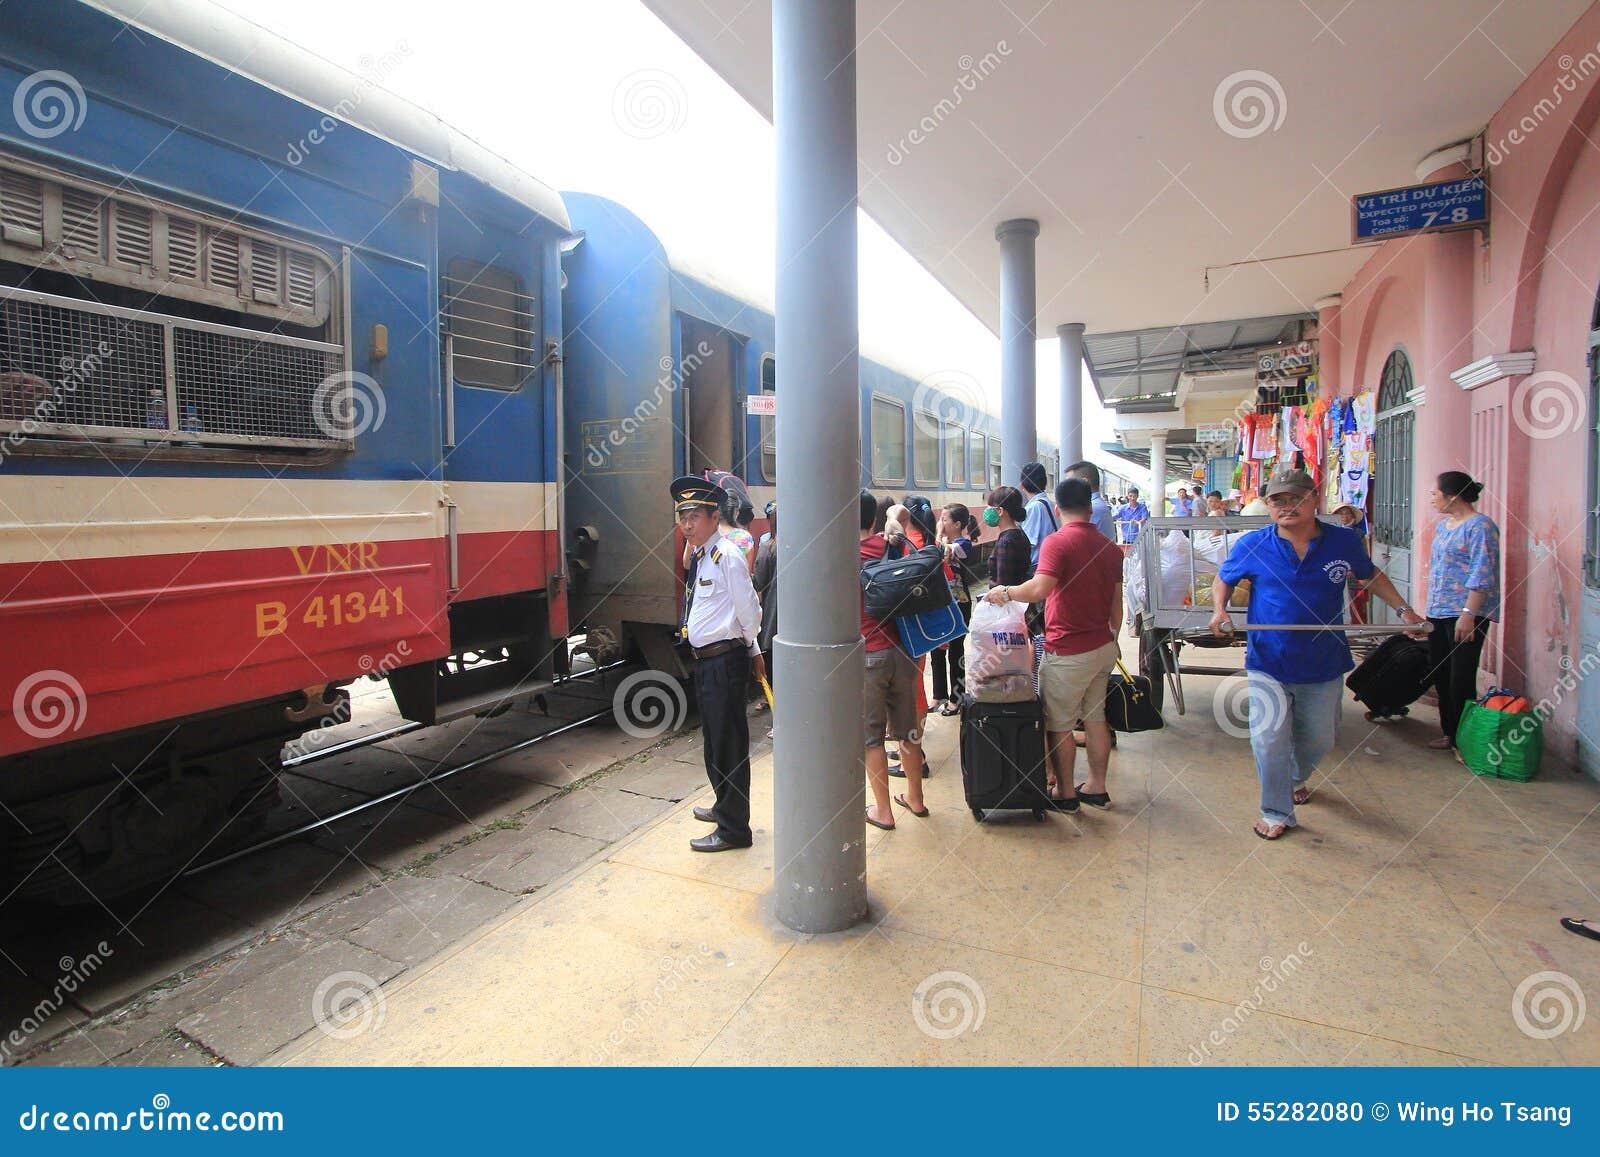 Vietname Hue Railway Station